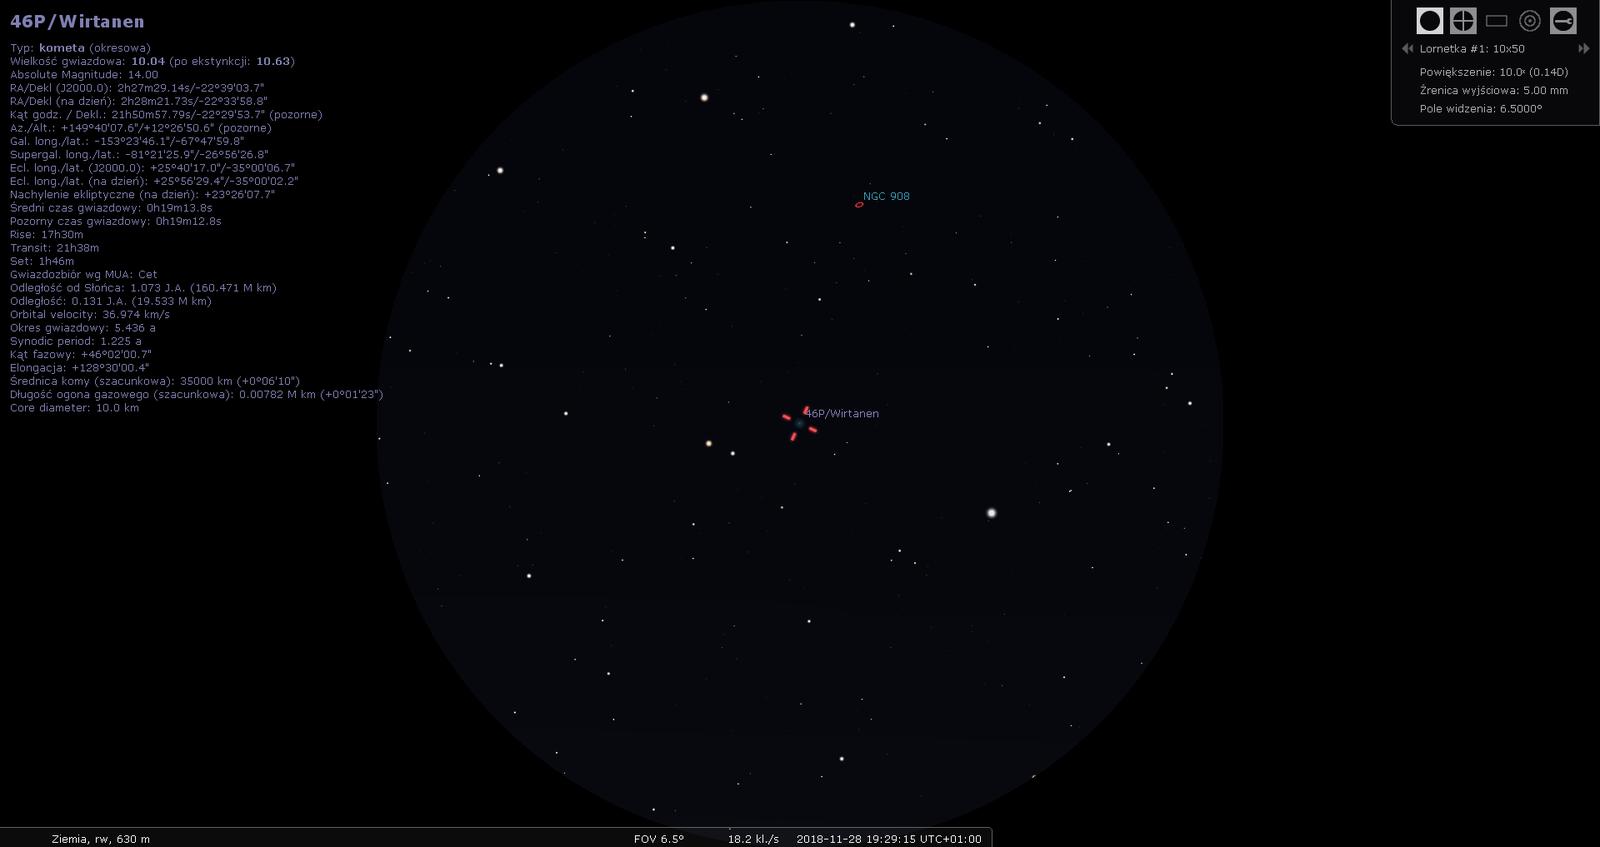 stellarium-012.thumb.png.a4a39ff6cc849c29a2a8b72e8c7364d4.png